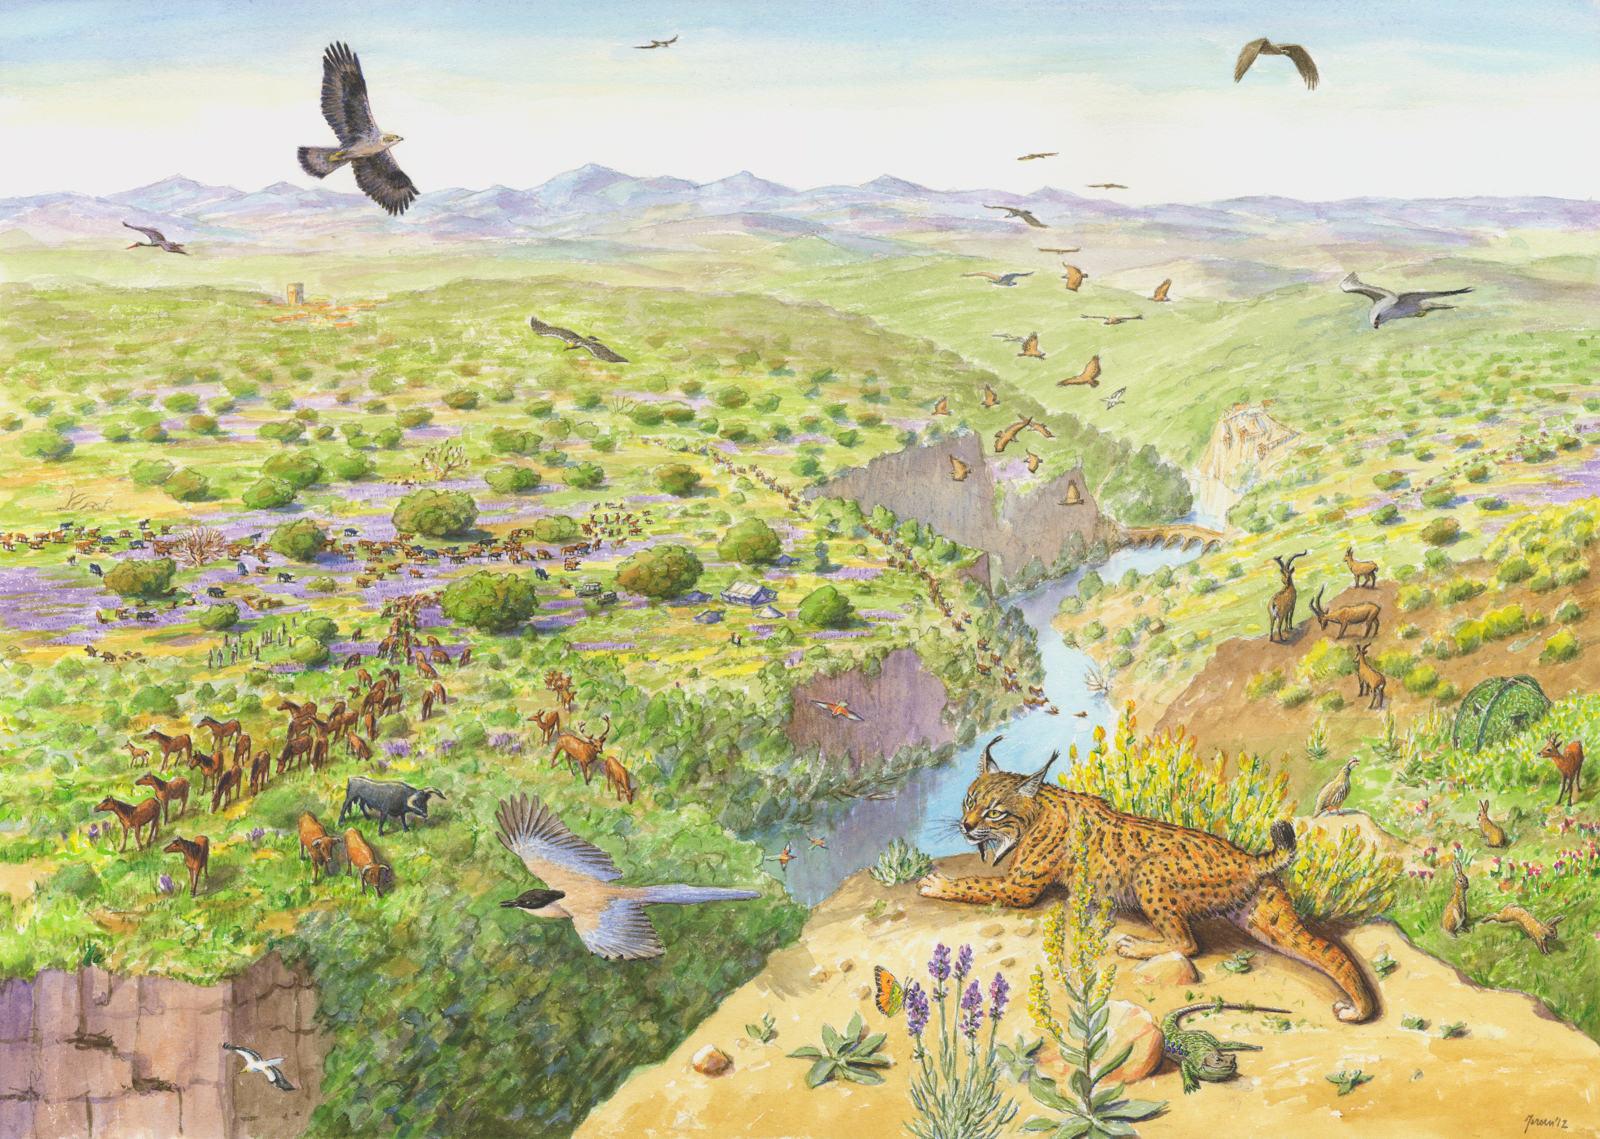 Artist's vision of the Western Iberia rewilding area.